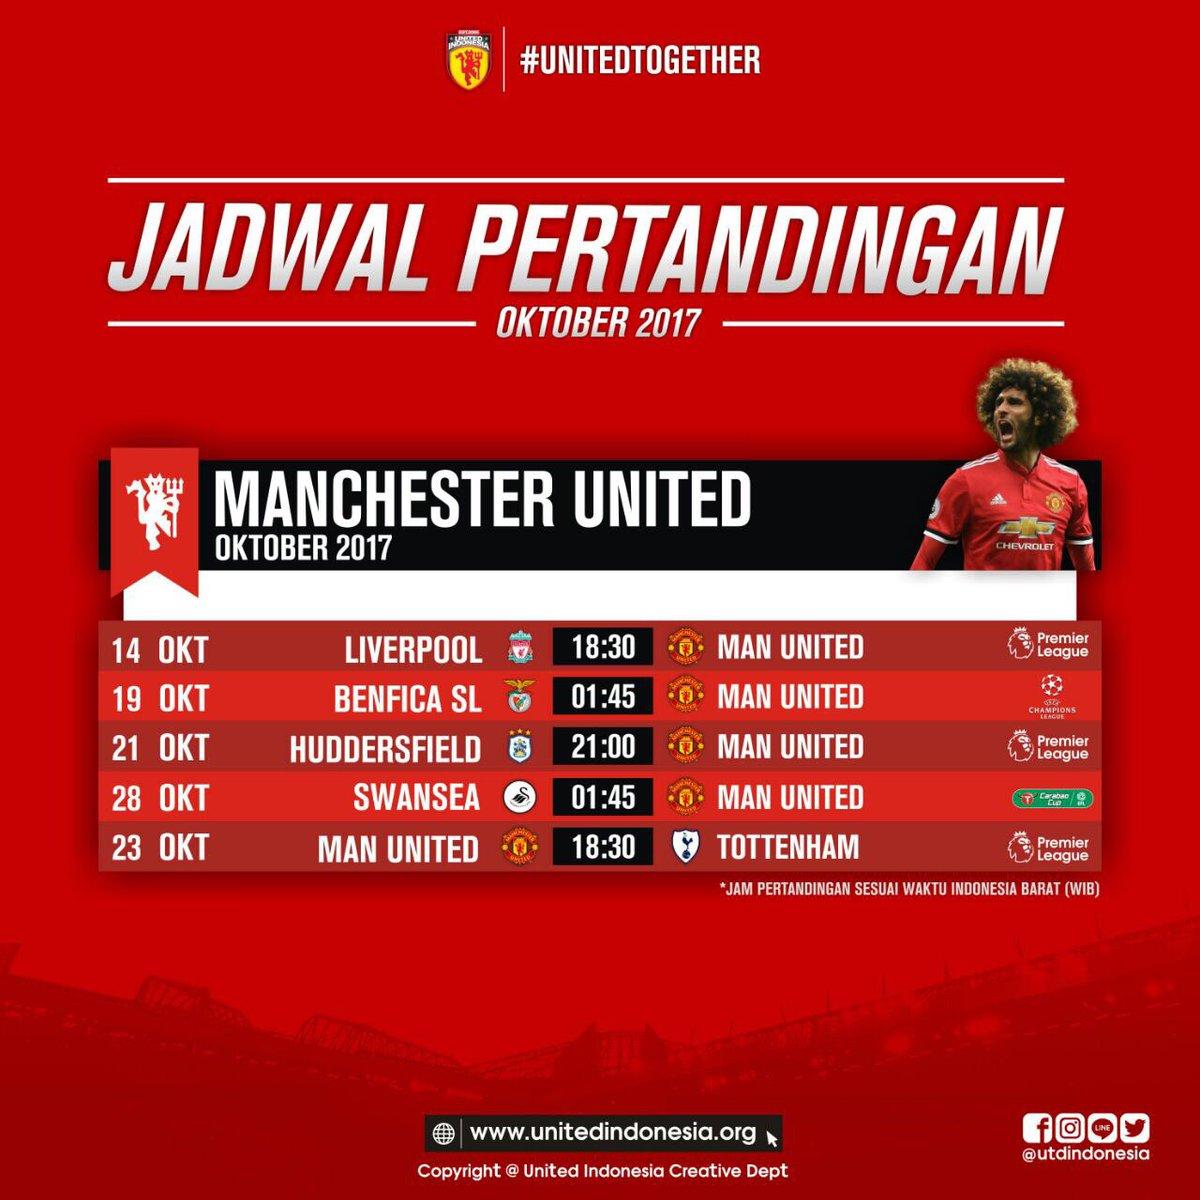 United Indonesia V Twitter Berikut Adalah Jadwal Pertandingan Manchester United Selama Bulan Oktober 2017 Jam Pertandingan Dalam Wib Utdindonesia Unitedtogether Https T Co Gc2u5eapax